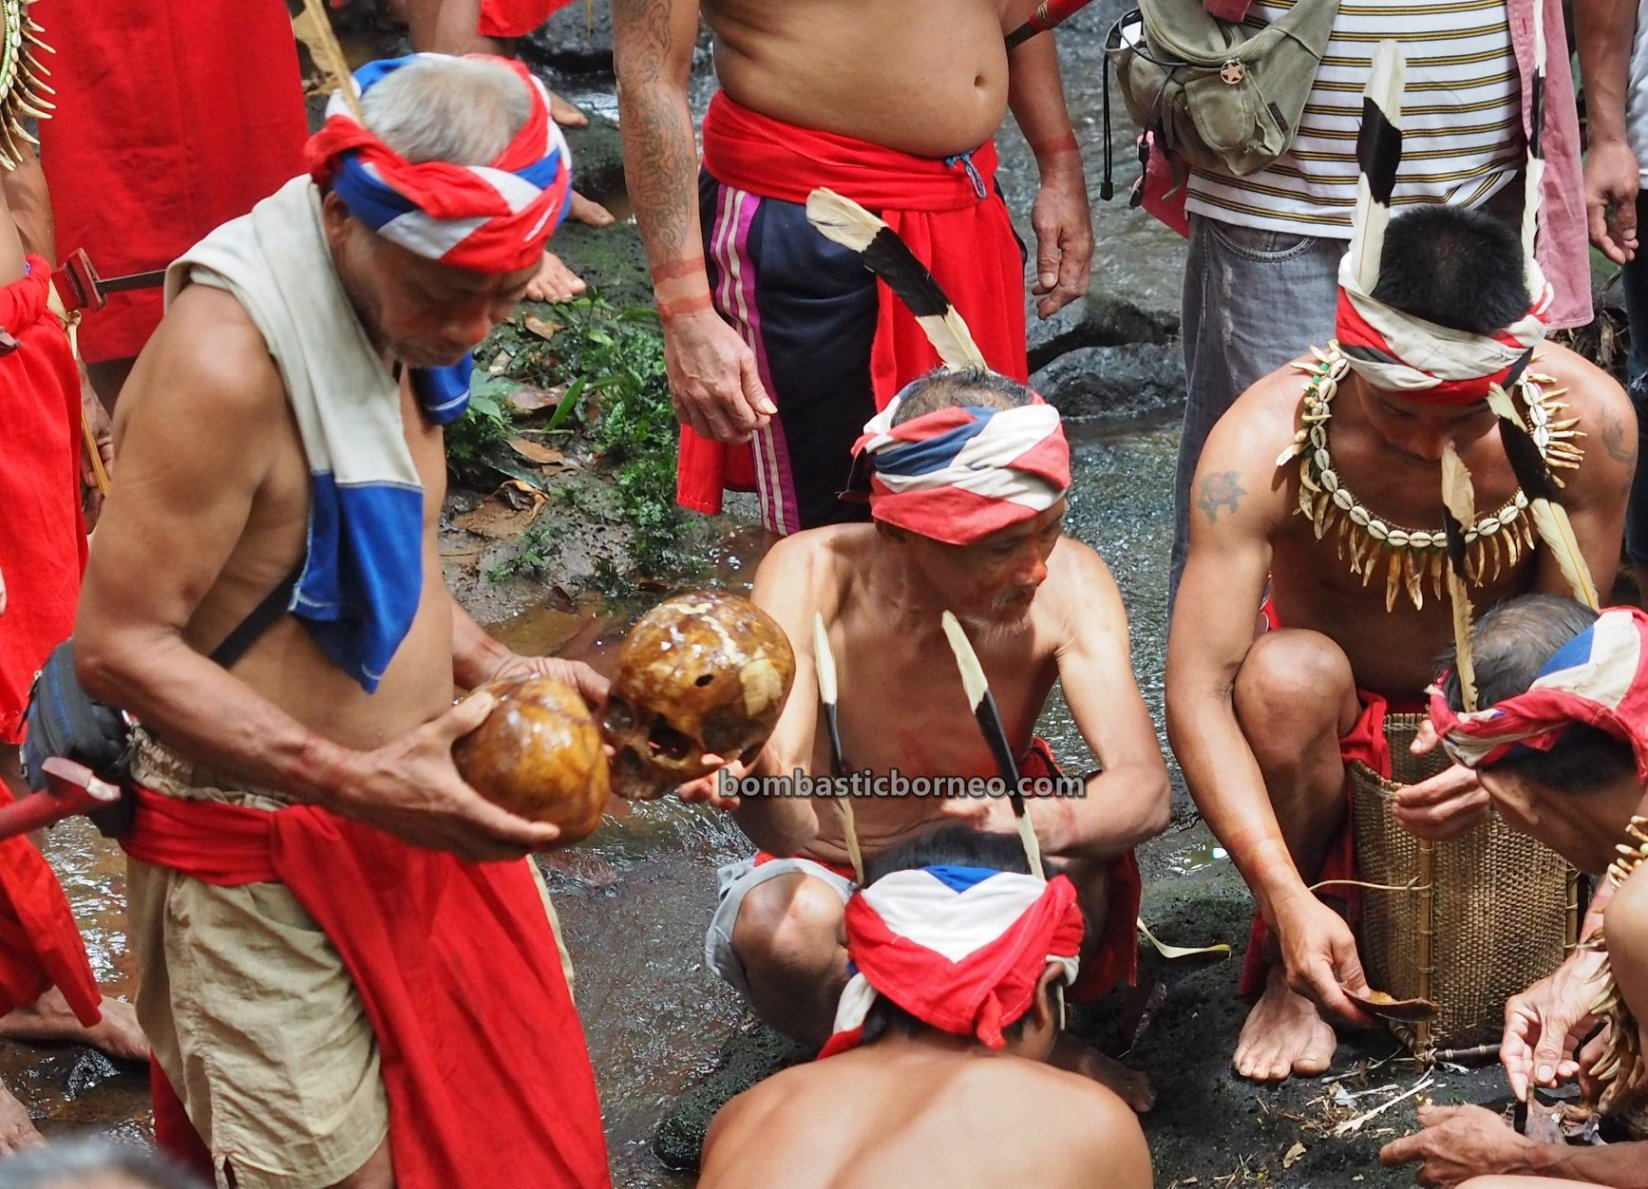 Mandi Tengkorak, Nyobeng Rambai, Harvest Festival, authentic, ritual, culture, Indonesia, West Kalimantan, Bengkayang, Desa Sahan, Dayak Bidayuh, tribal, Tourism, tourist attraction, travel guide, Trans Borneo